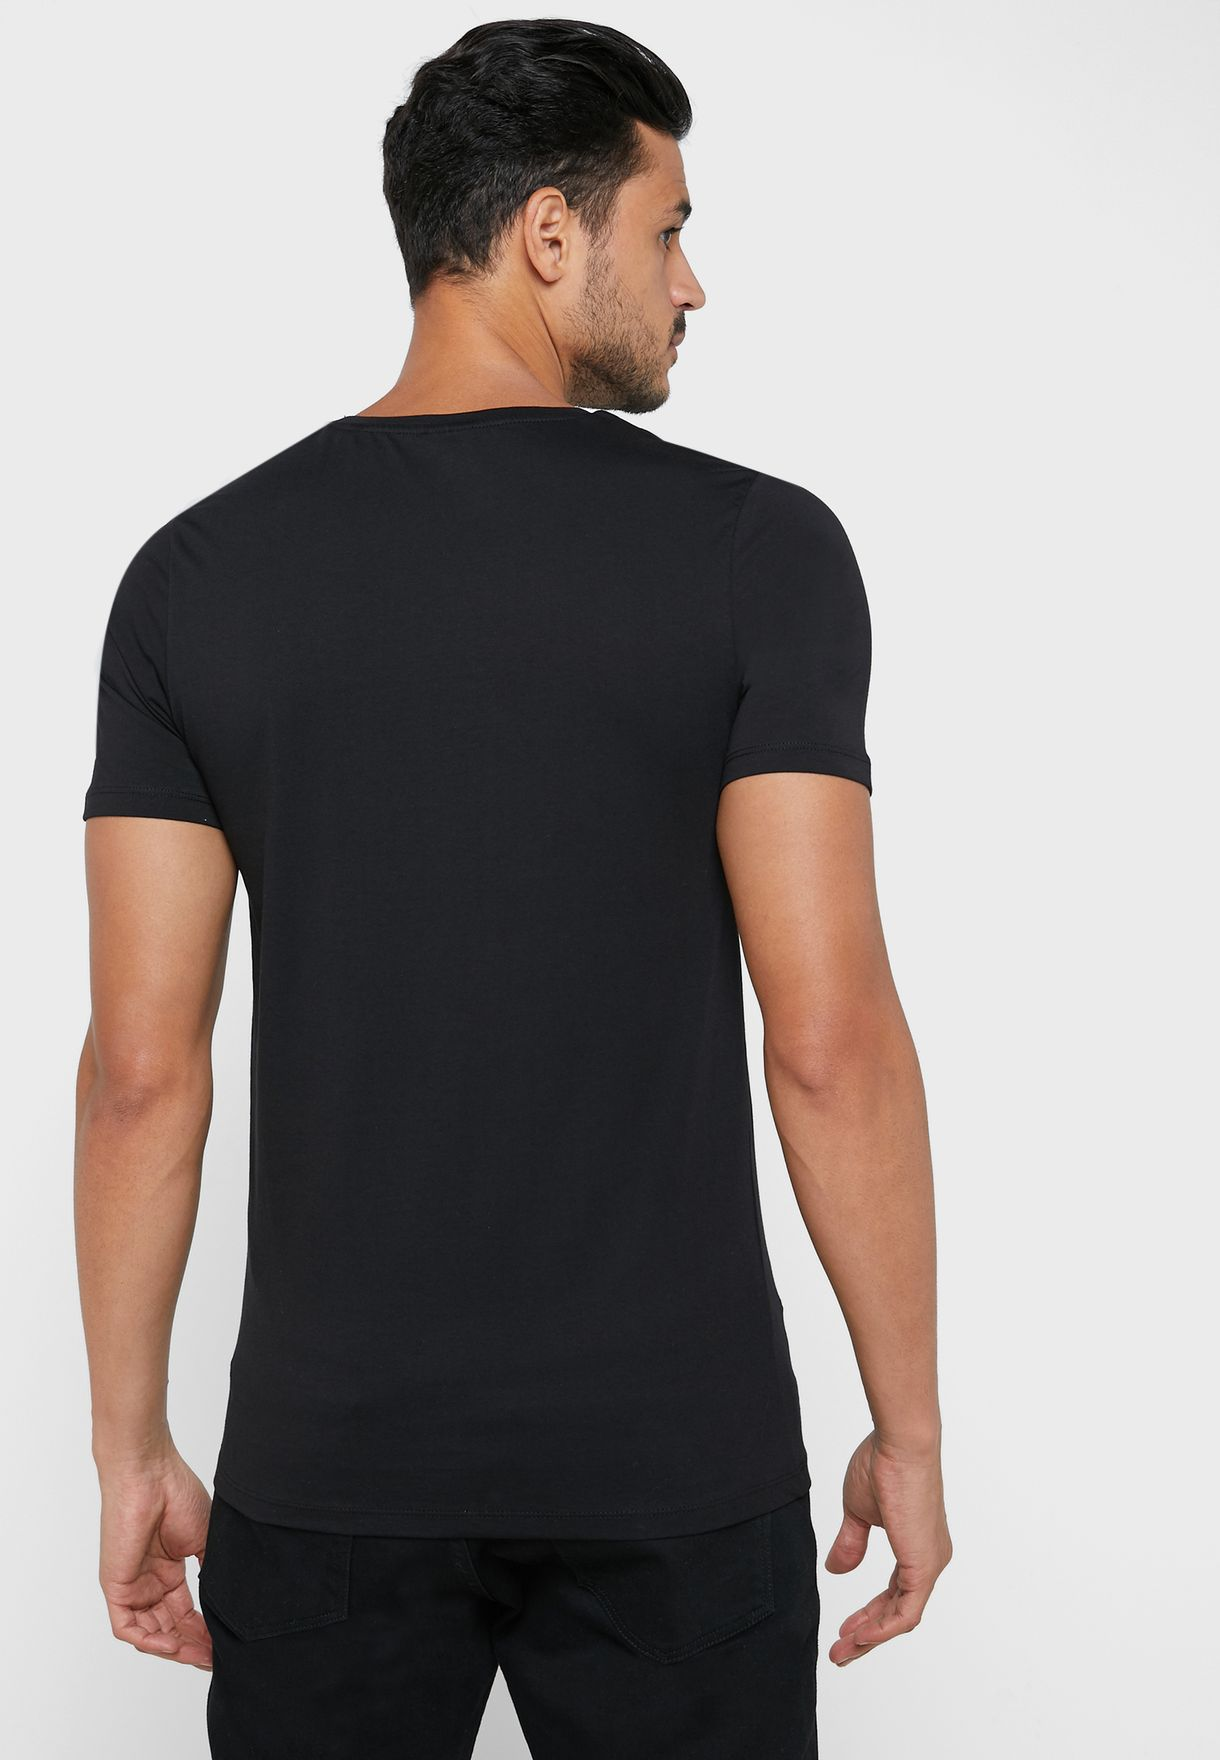 Cloak Slim Fit Crew Neck T-Shirt